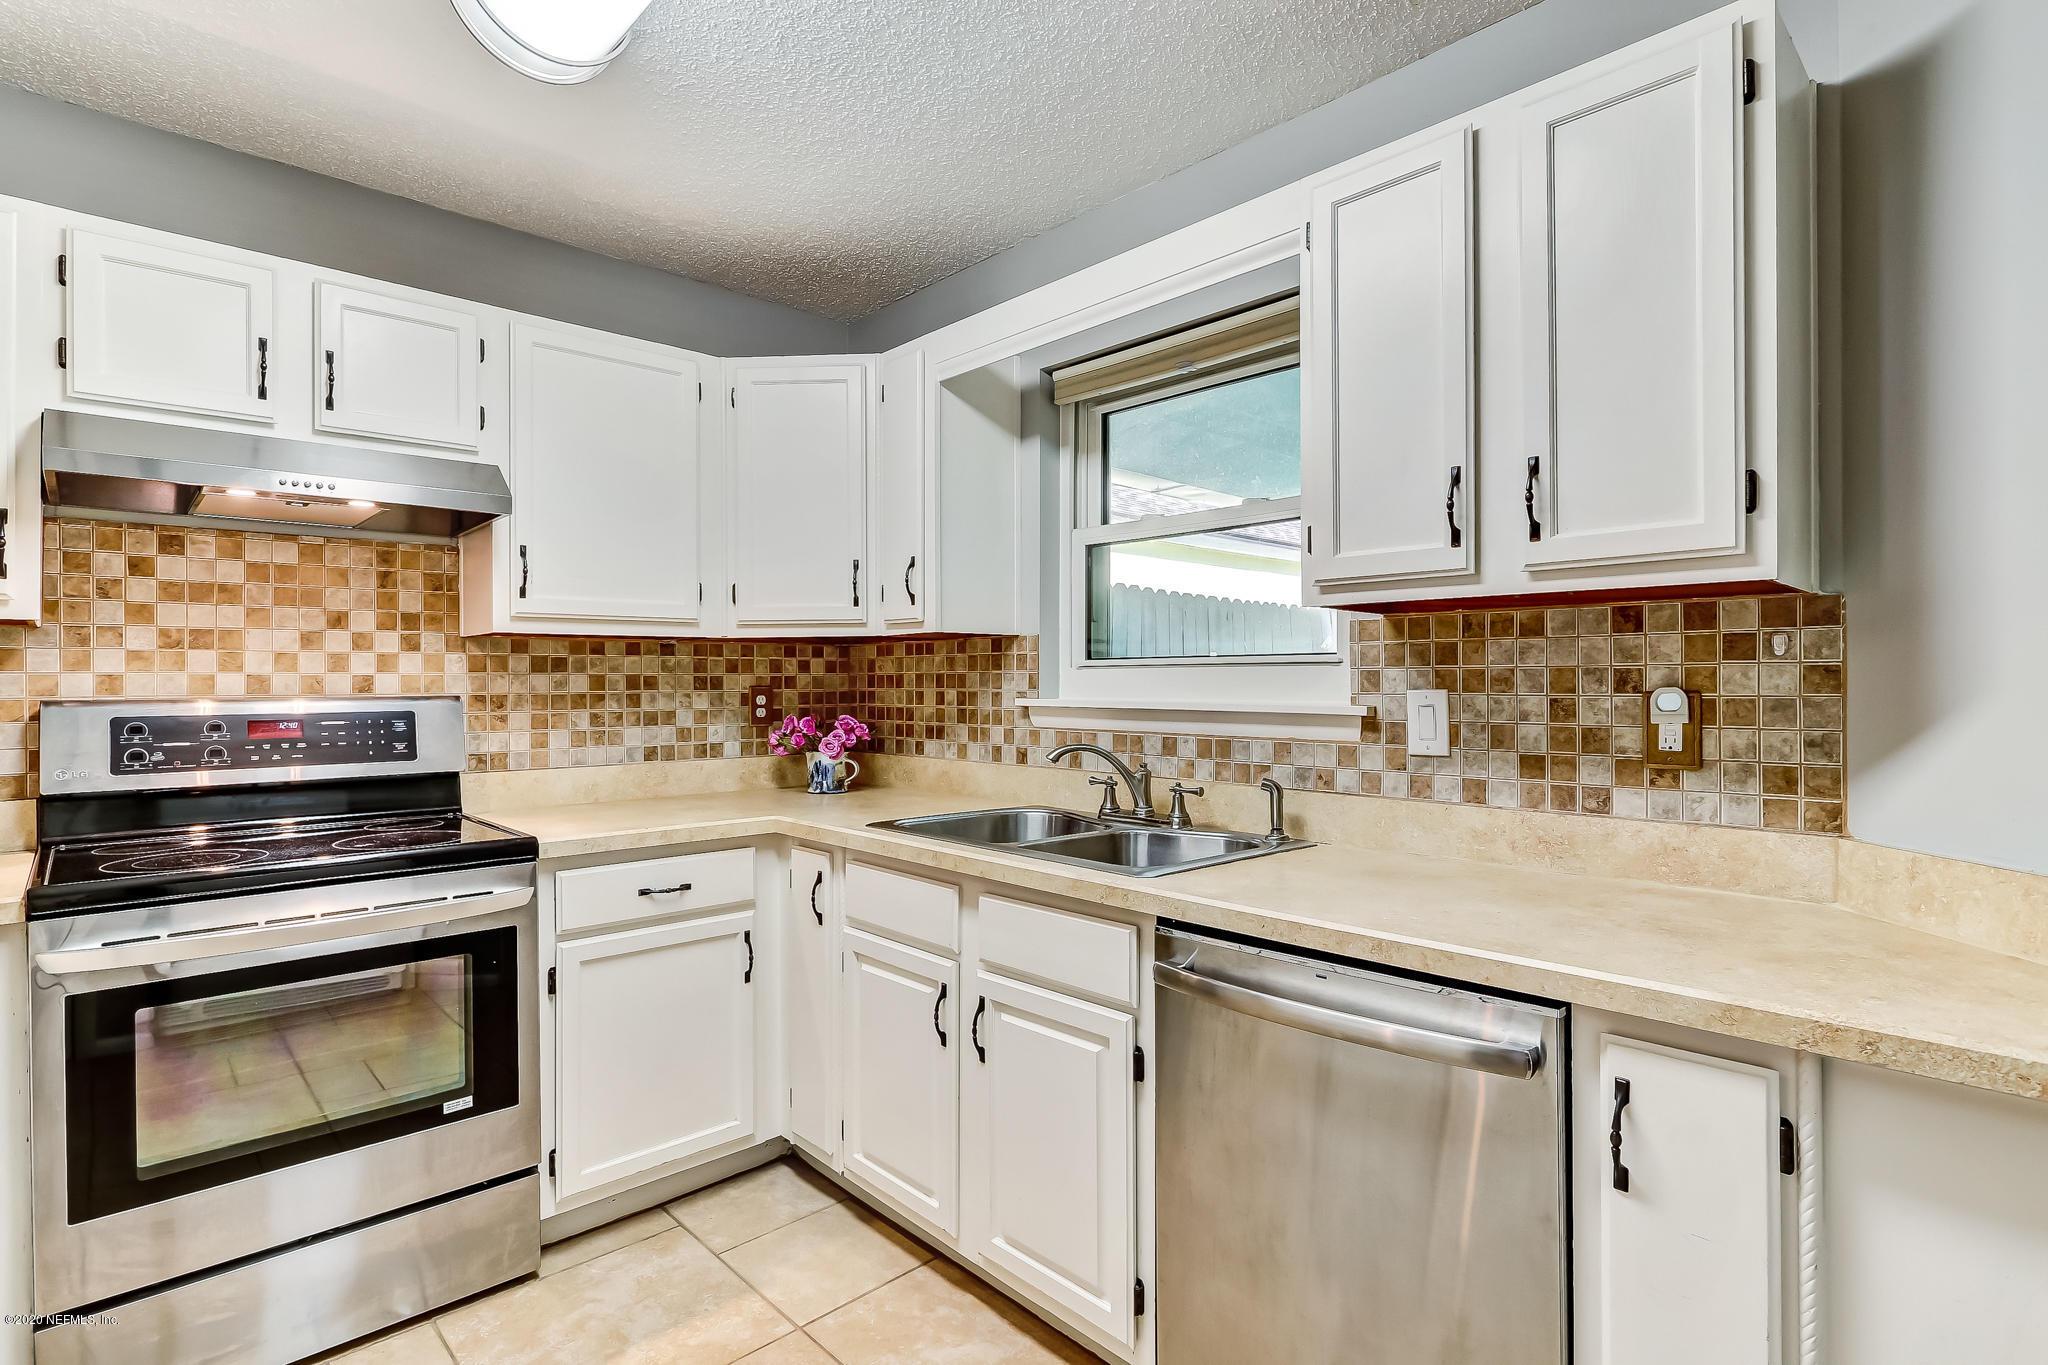 1325 EASTWIND, JACKSONVILLE BEACH, FLORIDA 32250, 3 Bedrooms Bedrooms, ,2 BathroomsBathrooms,Residential,For sale,EASTWIND,1081800